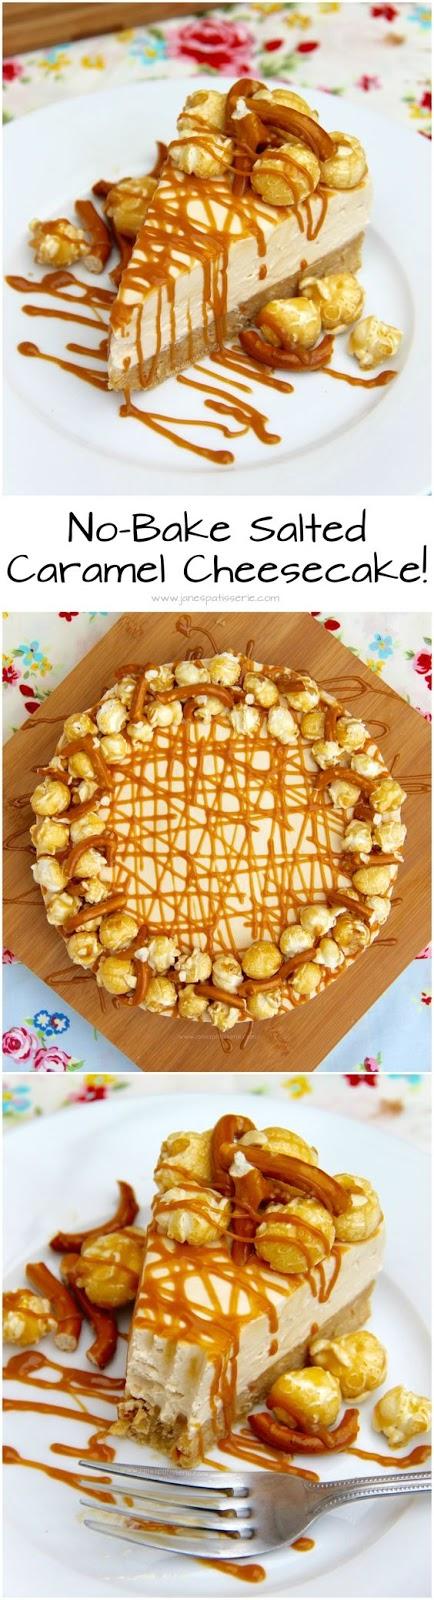 No-Bake Salted Caramel Cheesecake